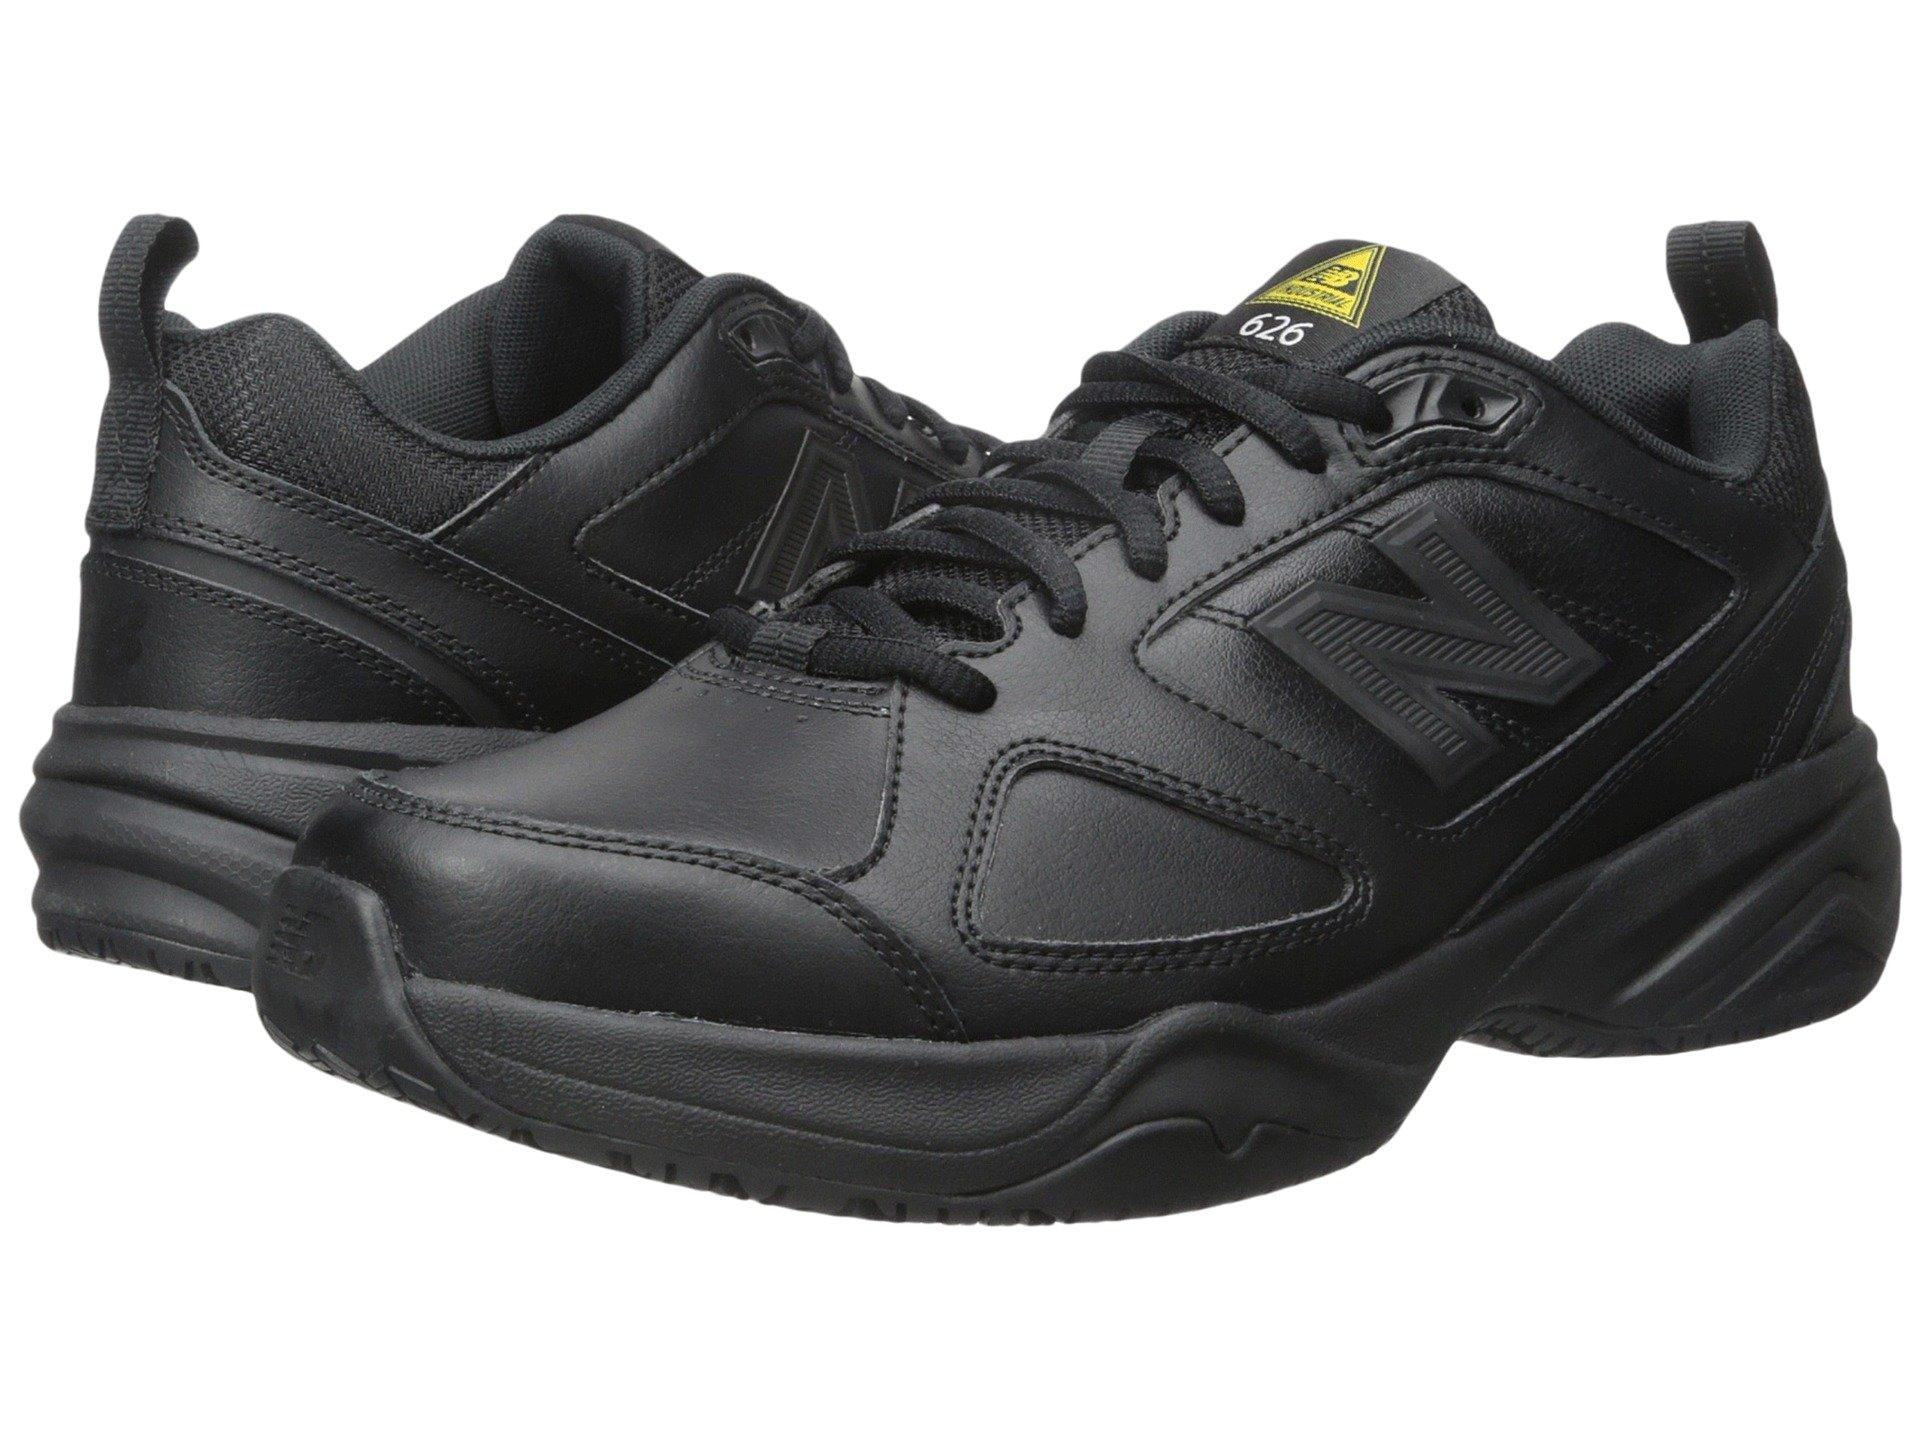 ab3b771d445d3 Men's Shoes + FREE SHIPPING | Zappos.com